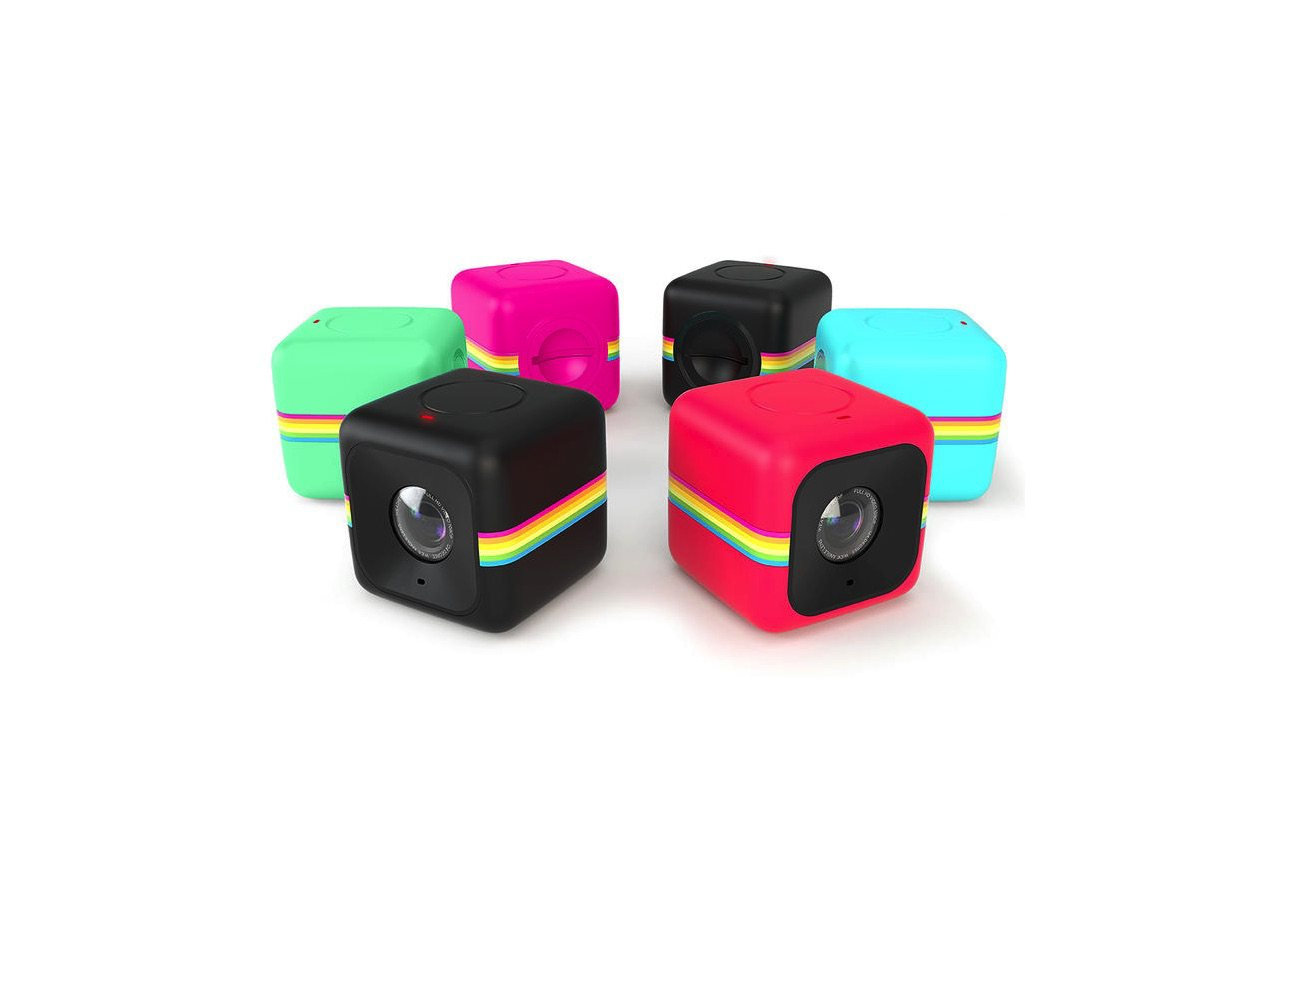 Polaroid Cube With WiFi